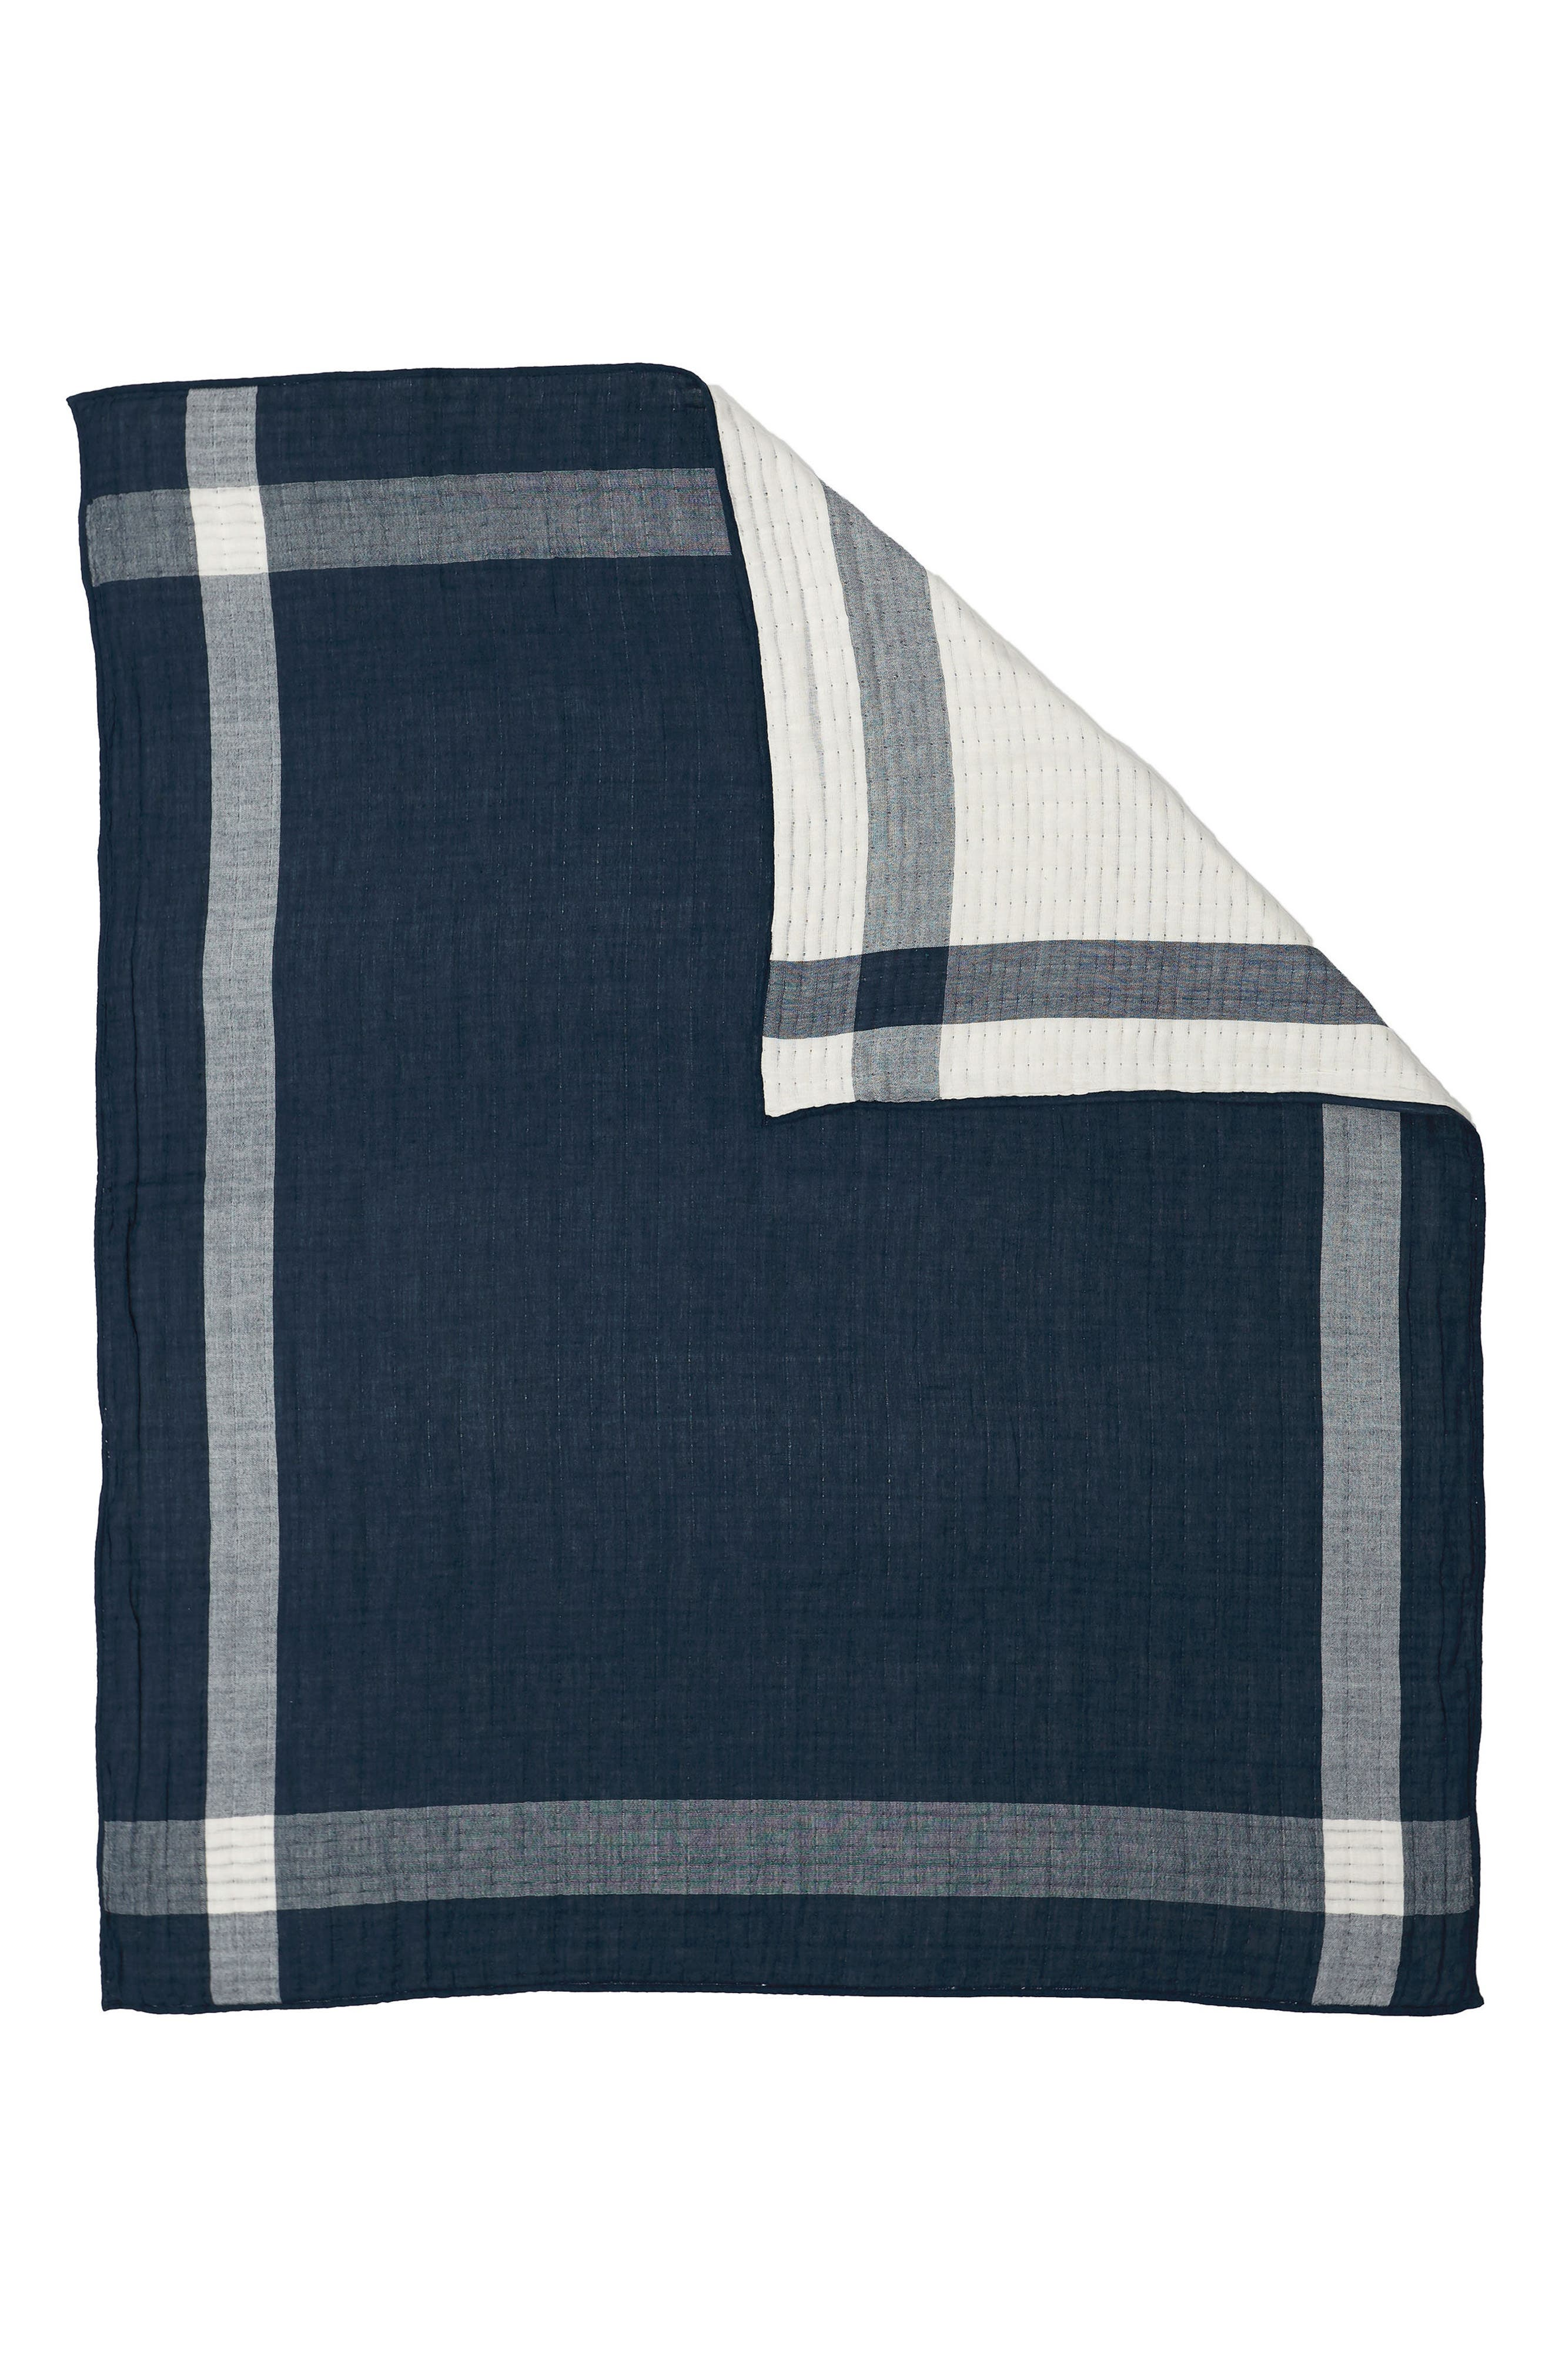 Sidekick Blanket,                             Main thumbnail 1, color,                             Navy